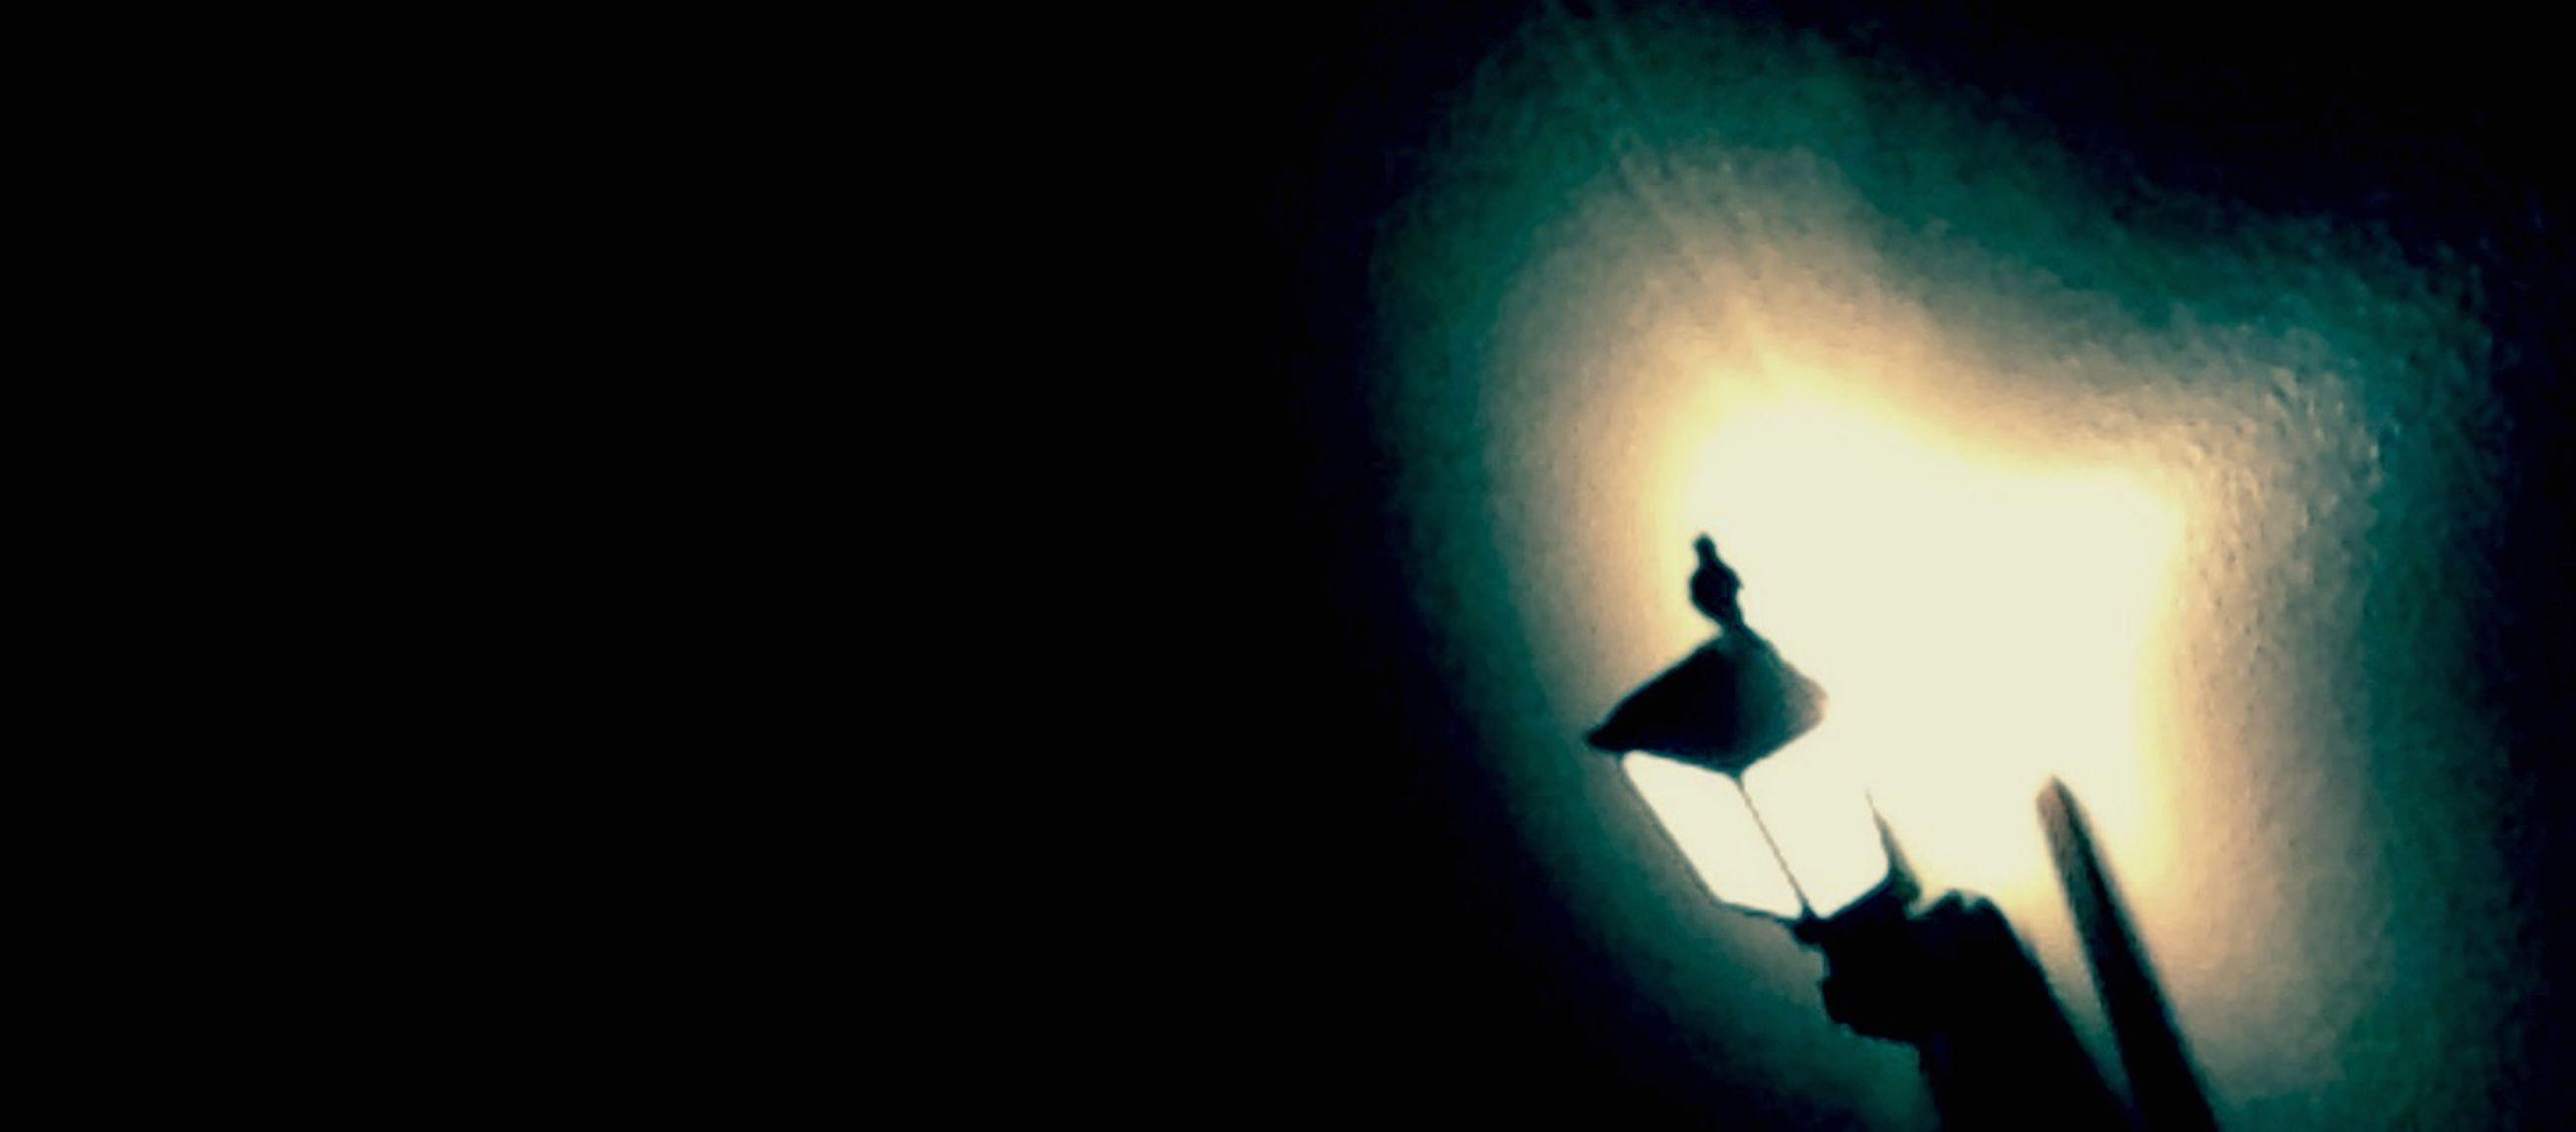 silhouette, low angle view, night, copy space, illuminated, dark, lighting equipment, sky, clear sky, street light, bird, glowing, outdoors, sun, light - natural phenomenon, no people, dusk, moon, sunlight, outline